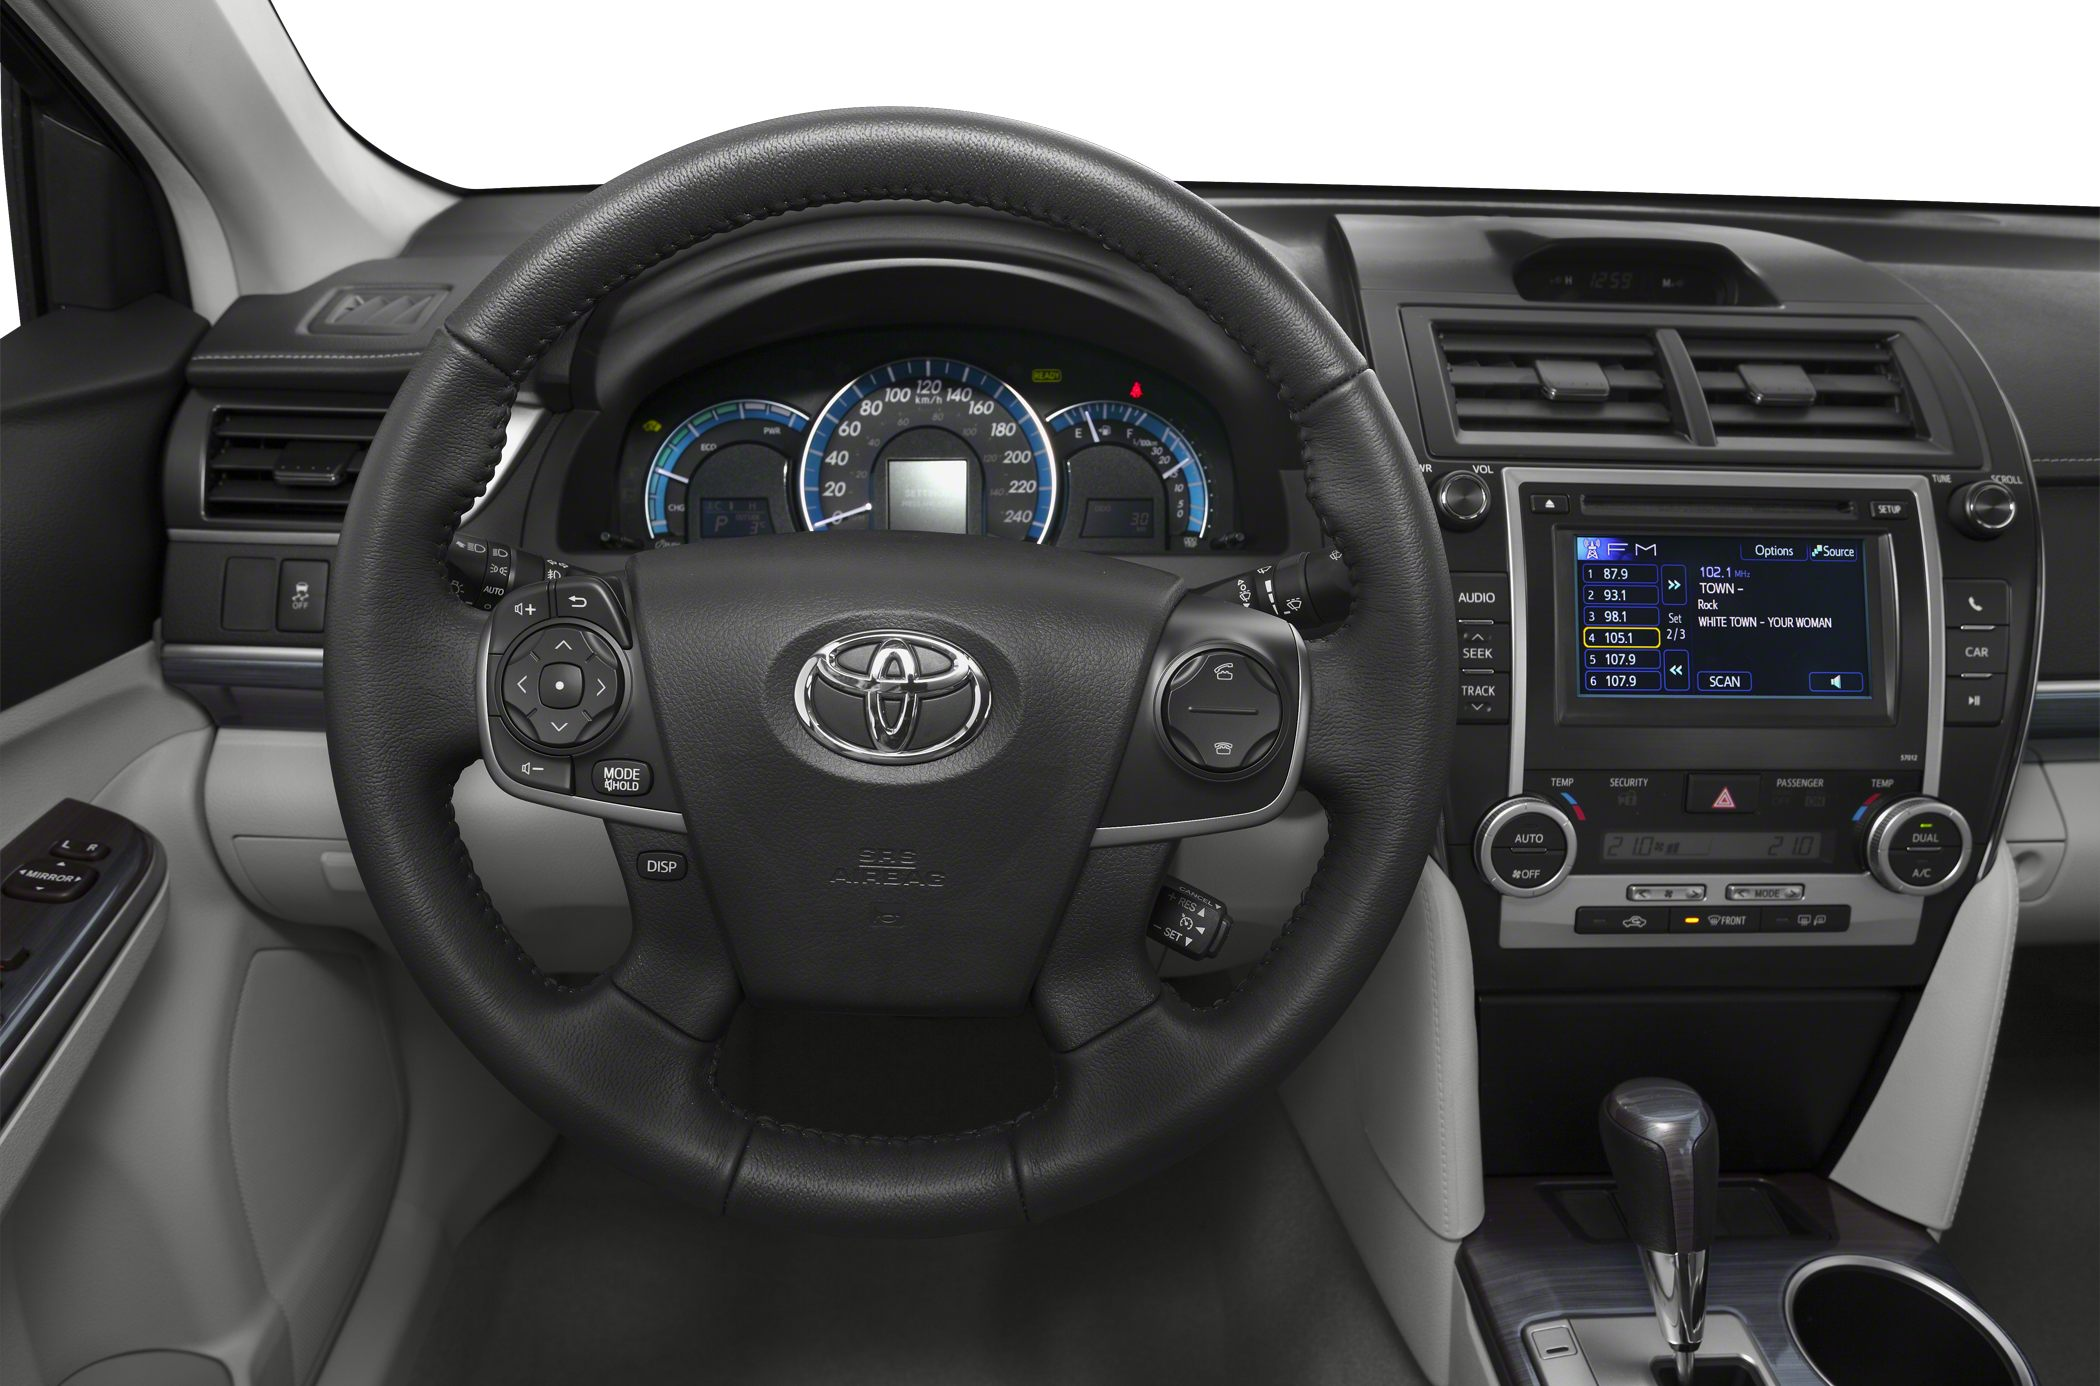 2014 Toyota Camry Hybrid Image 16